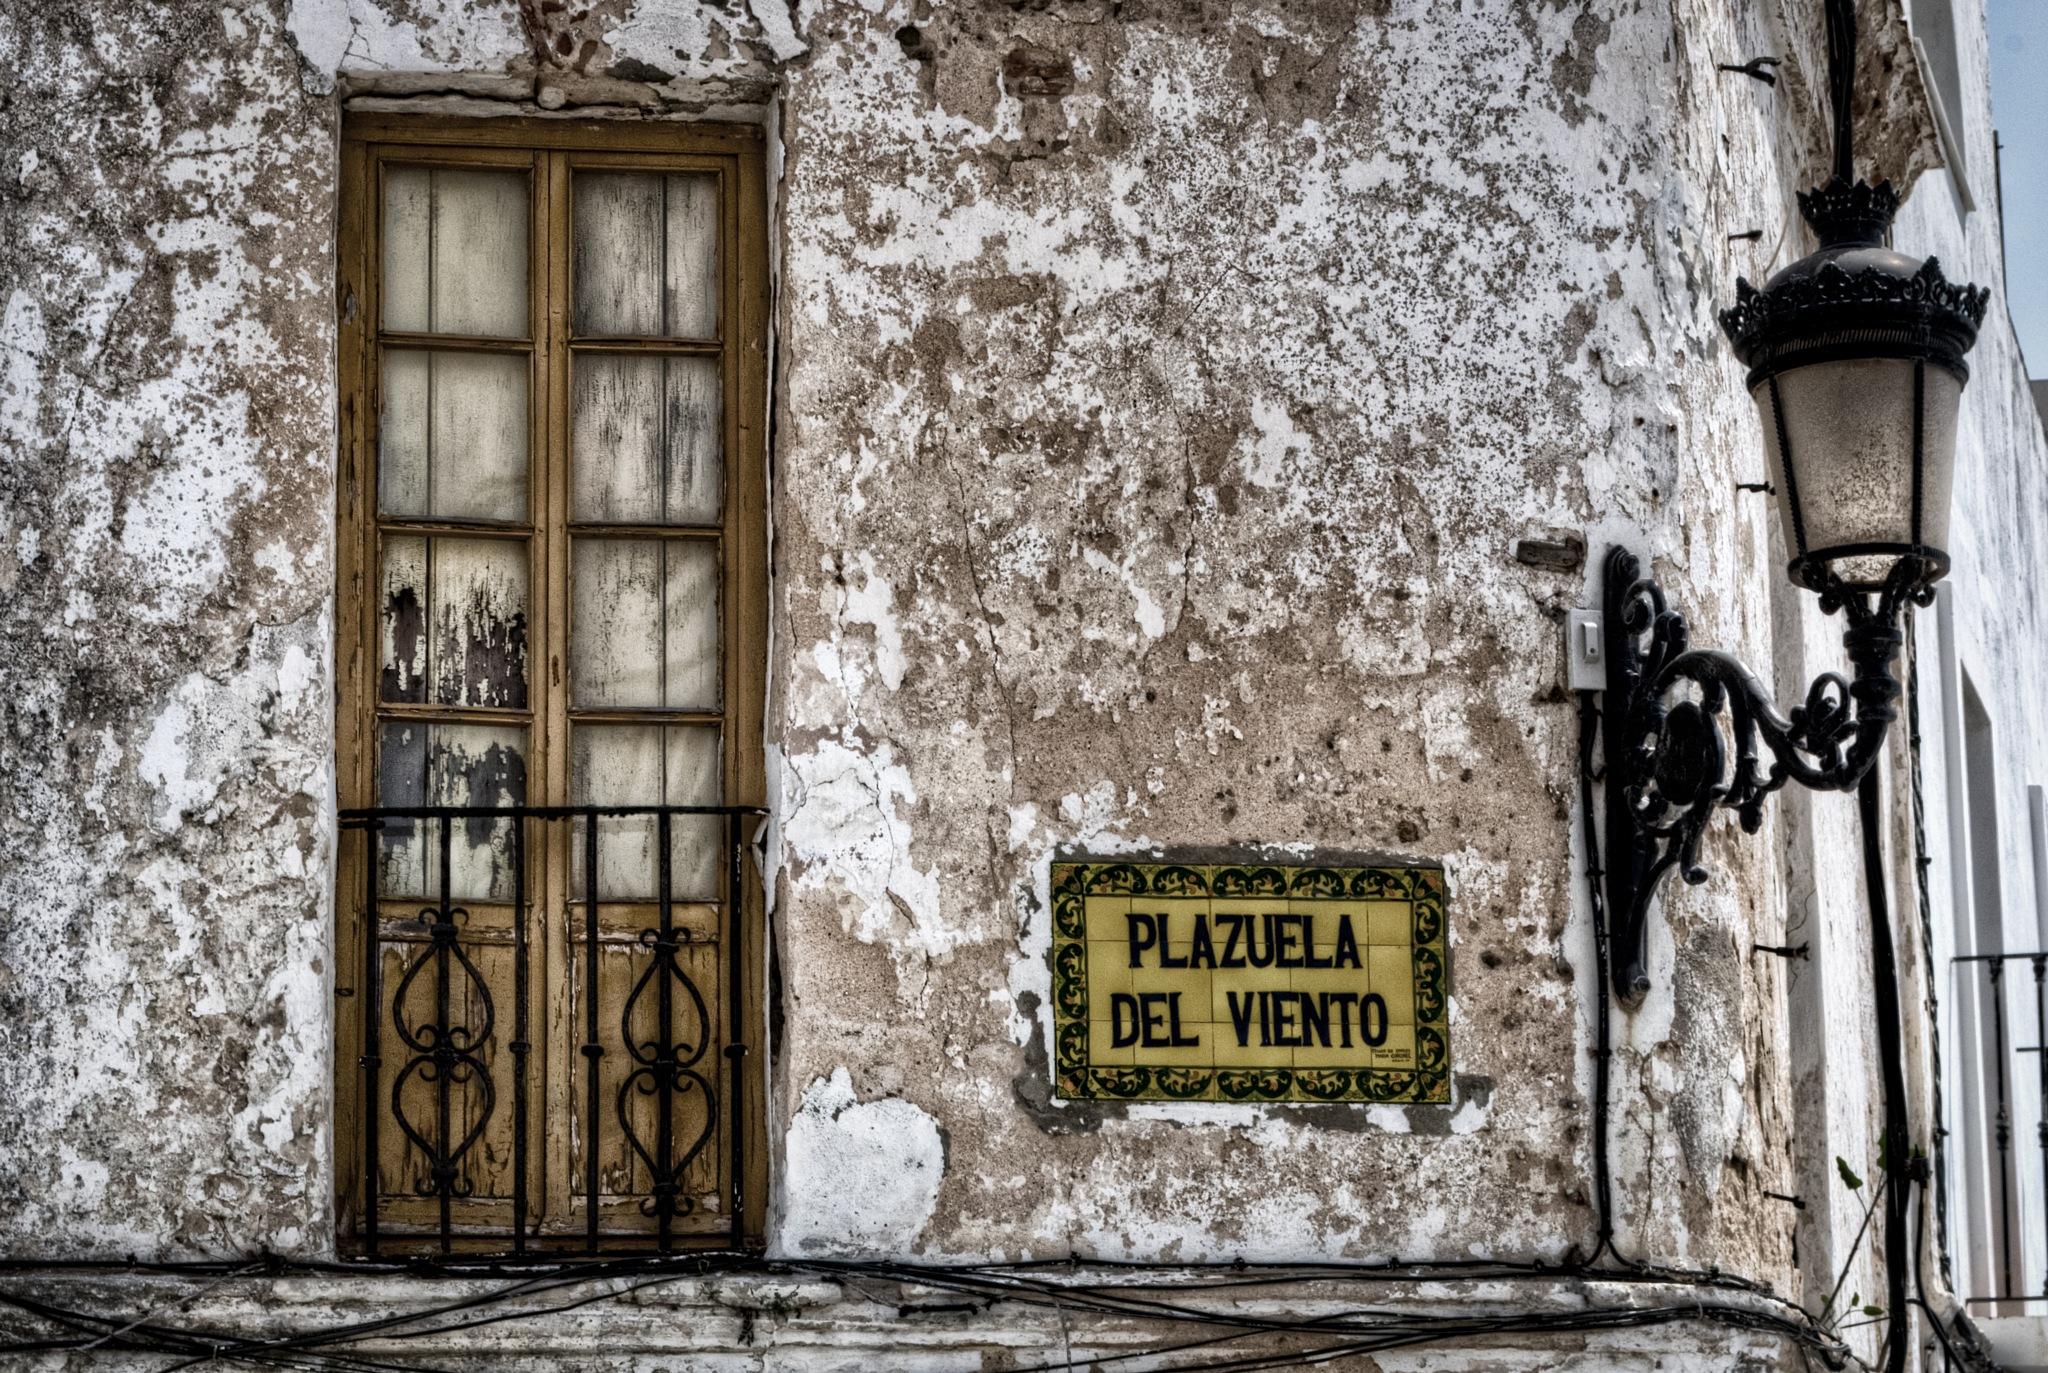 La Plazuela del Viento. / The Square of the Wind - Tarifa - Cádiz by MiguelOnPhotography